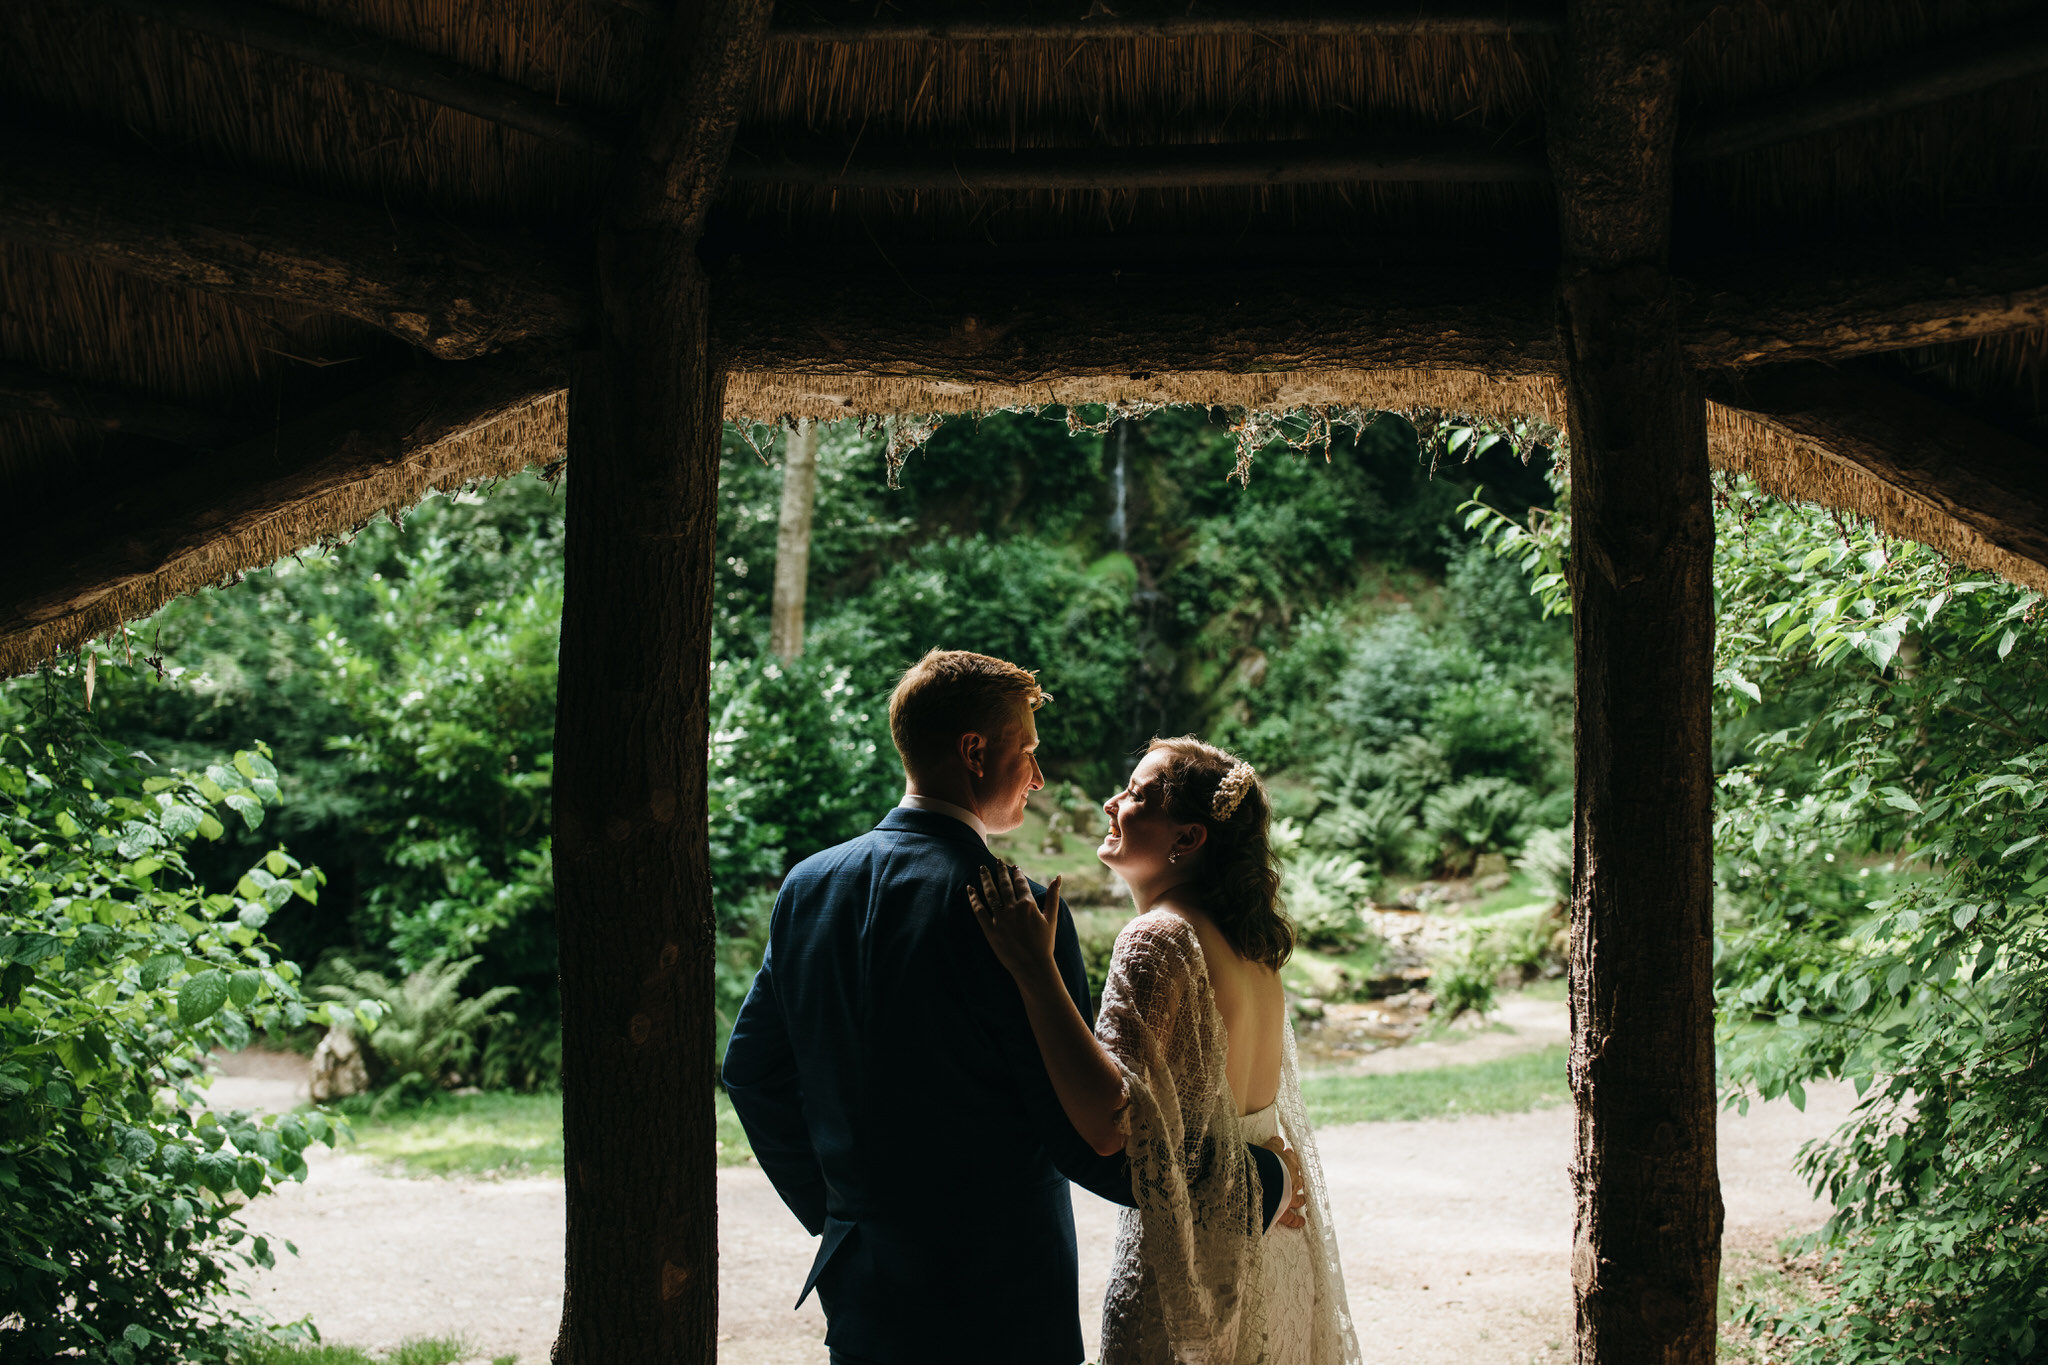 hestercombe gardens unposed wedding photographer